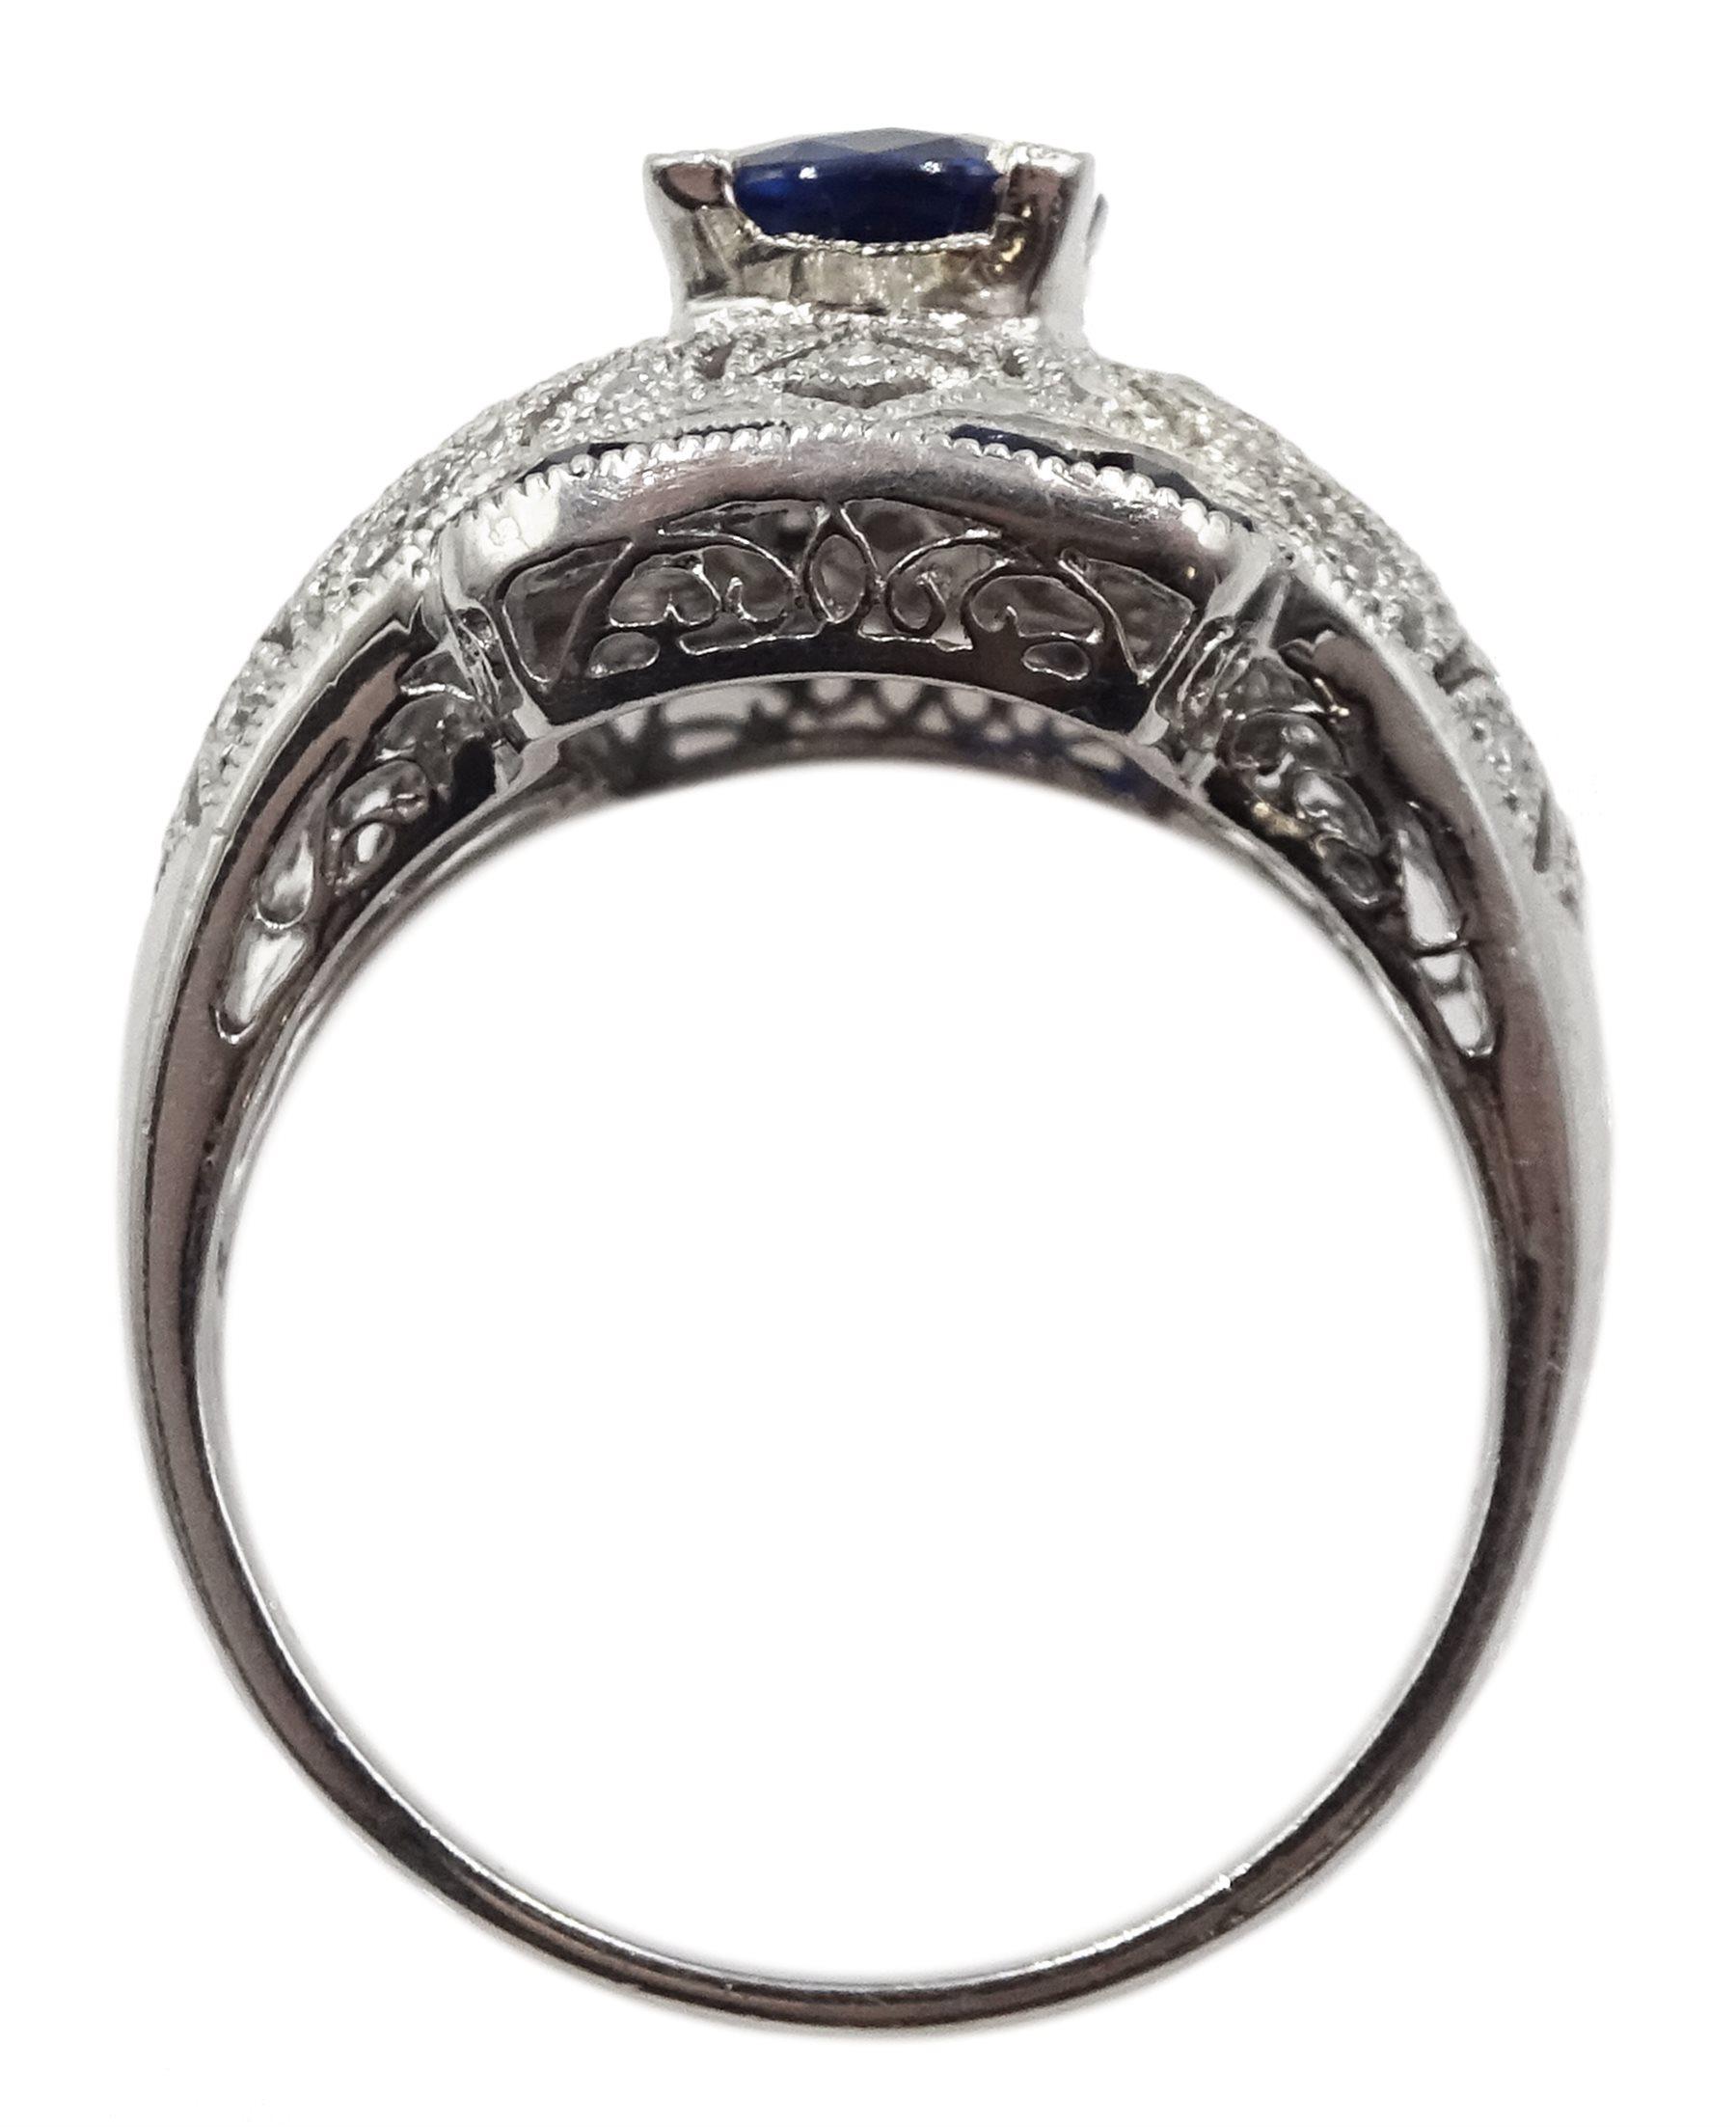 Platinum sapphire and diamond dress ring, pierced openwork setting, free UK mainland shipping - Image 6 of 6